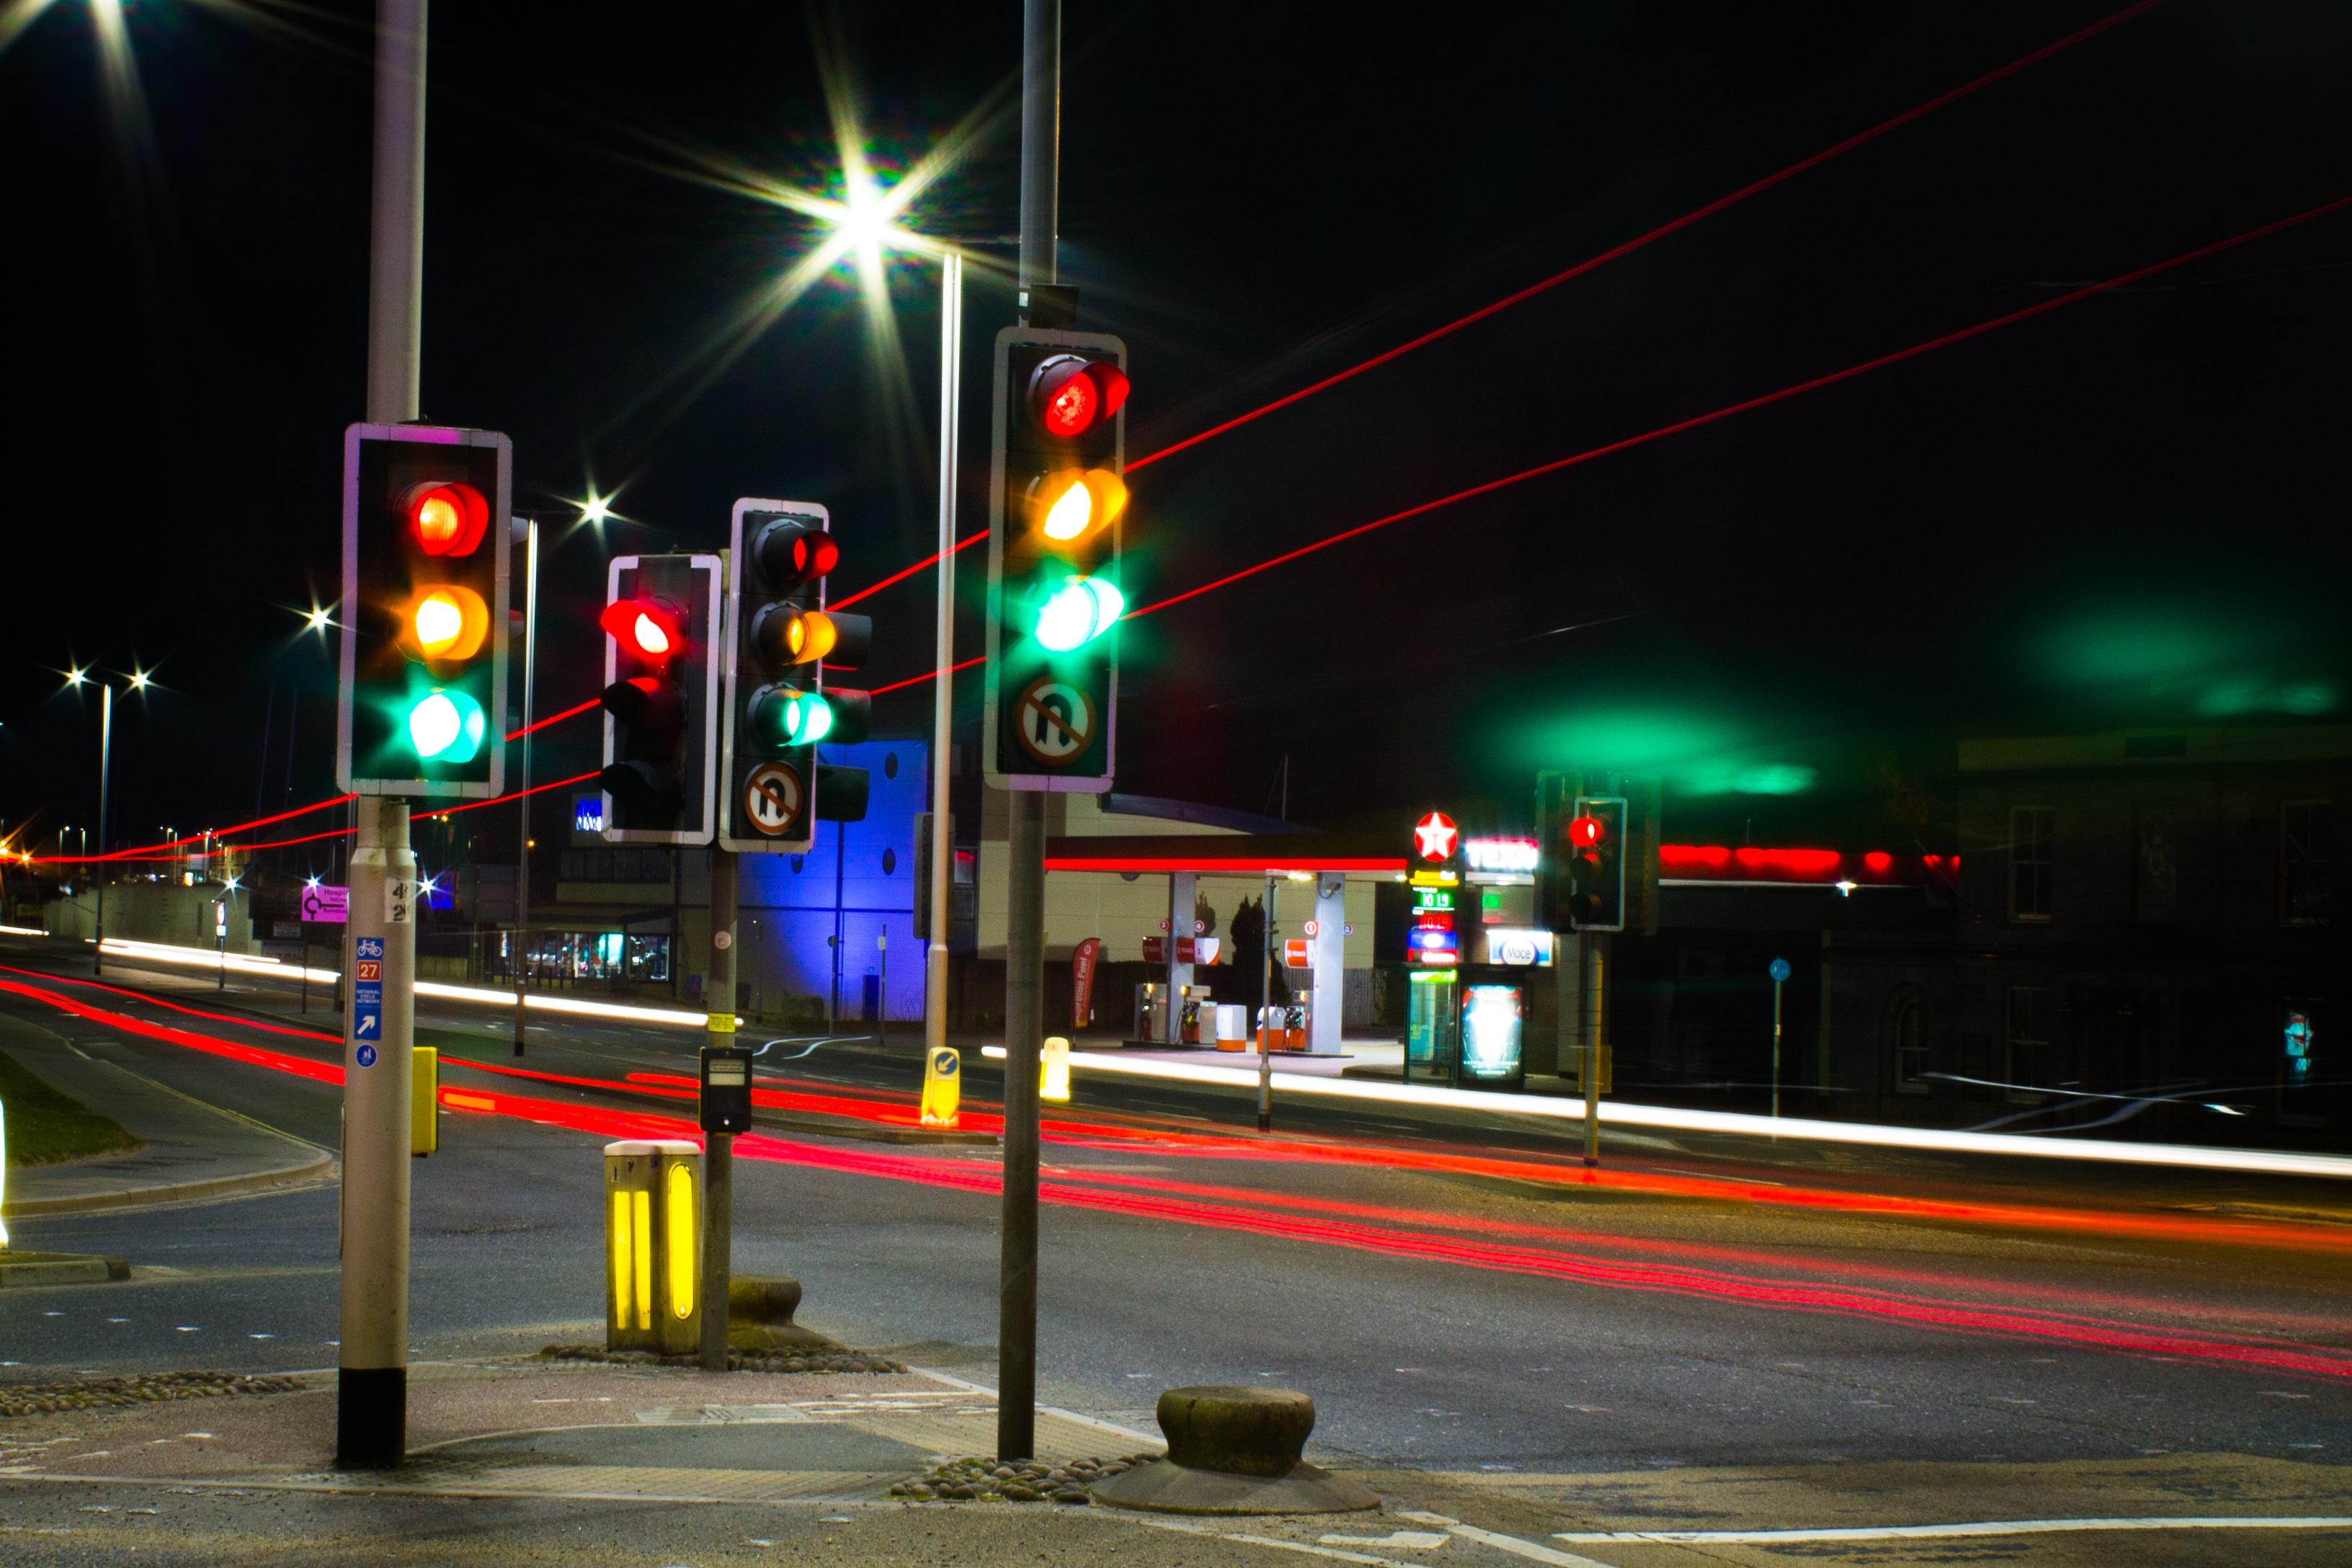 Free Images Road Car Night City Urban Travel Motion